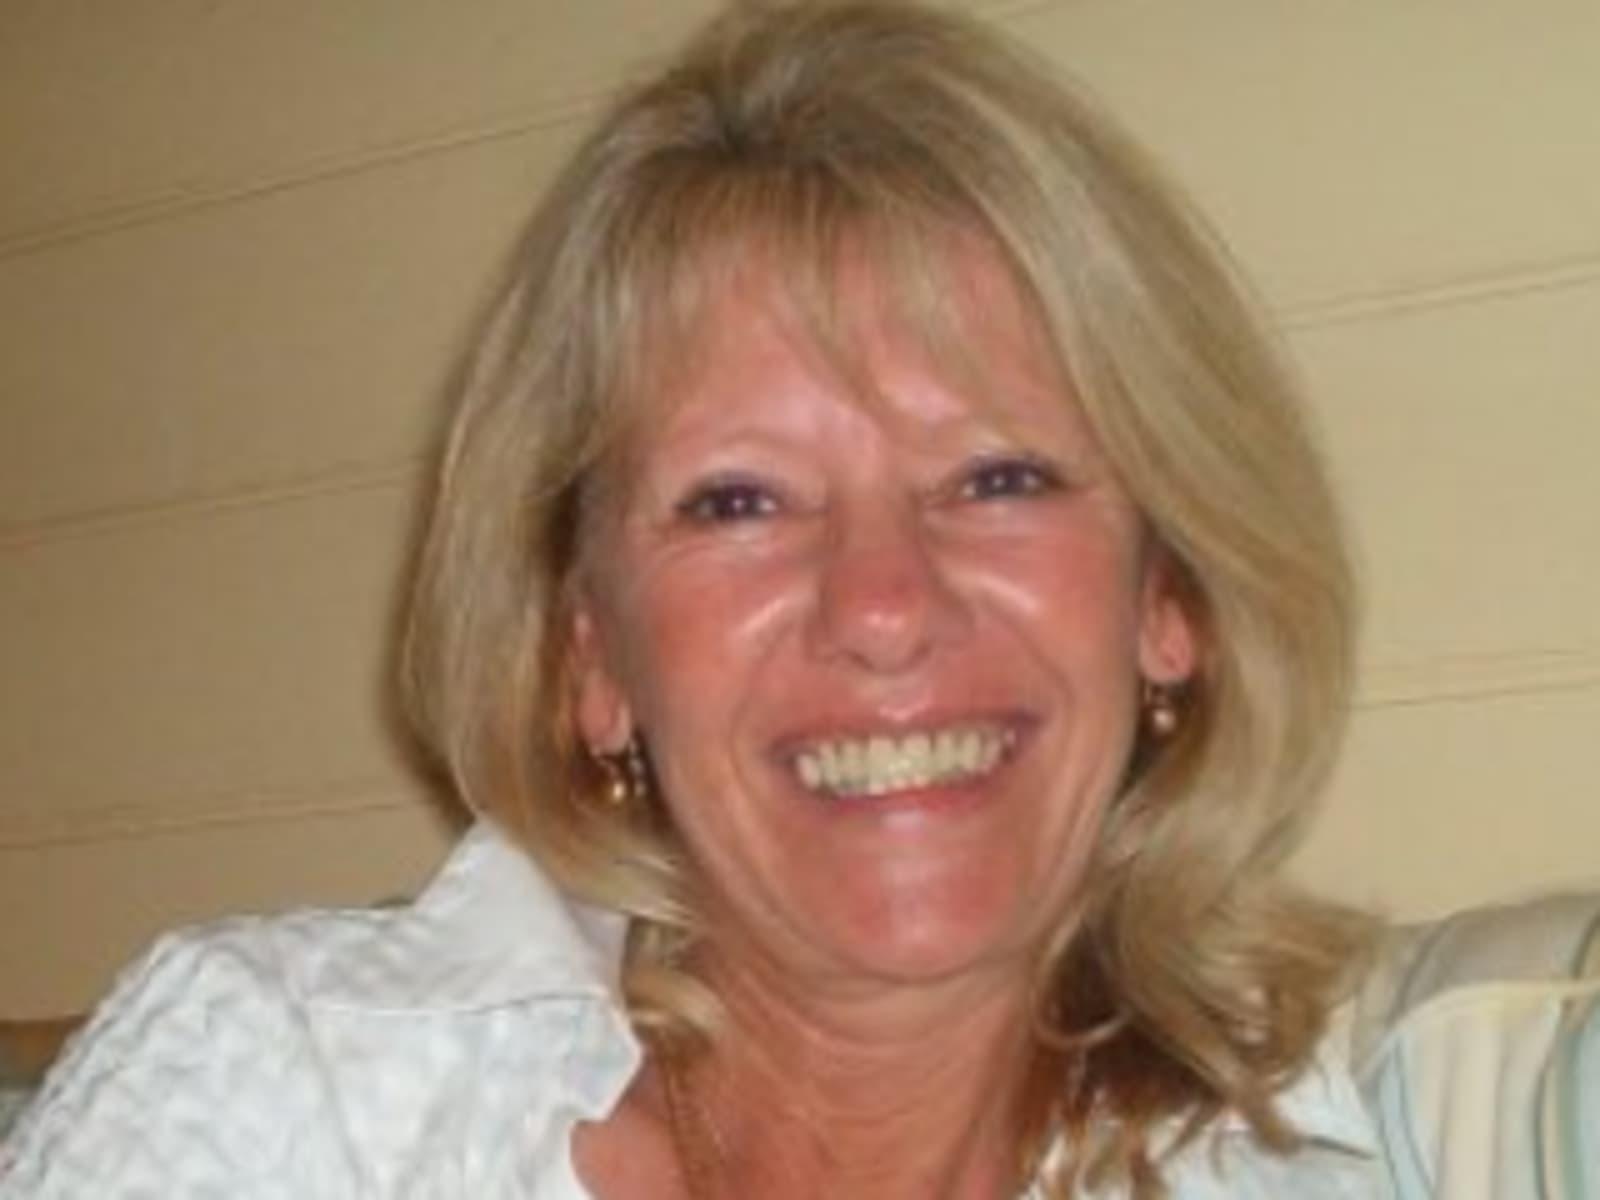 Janett from Gold Coast, Queensland, Australia